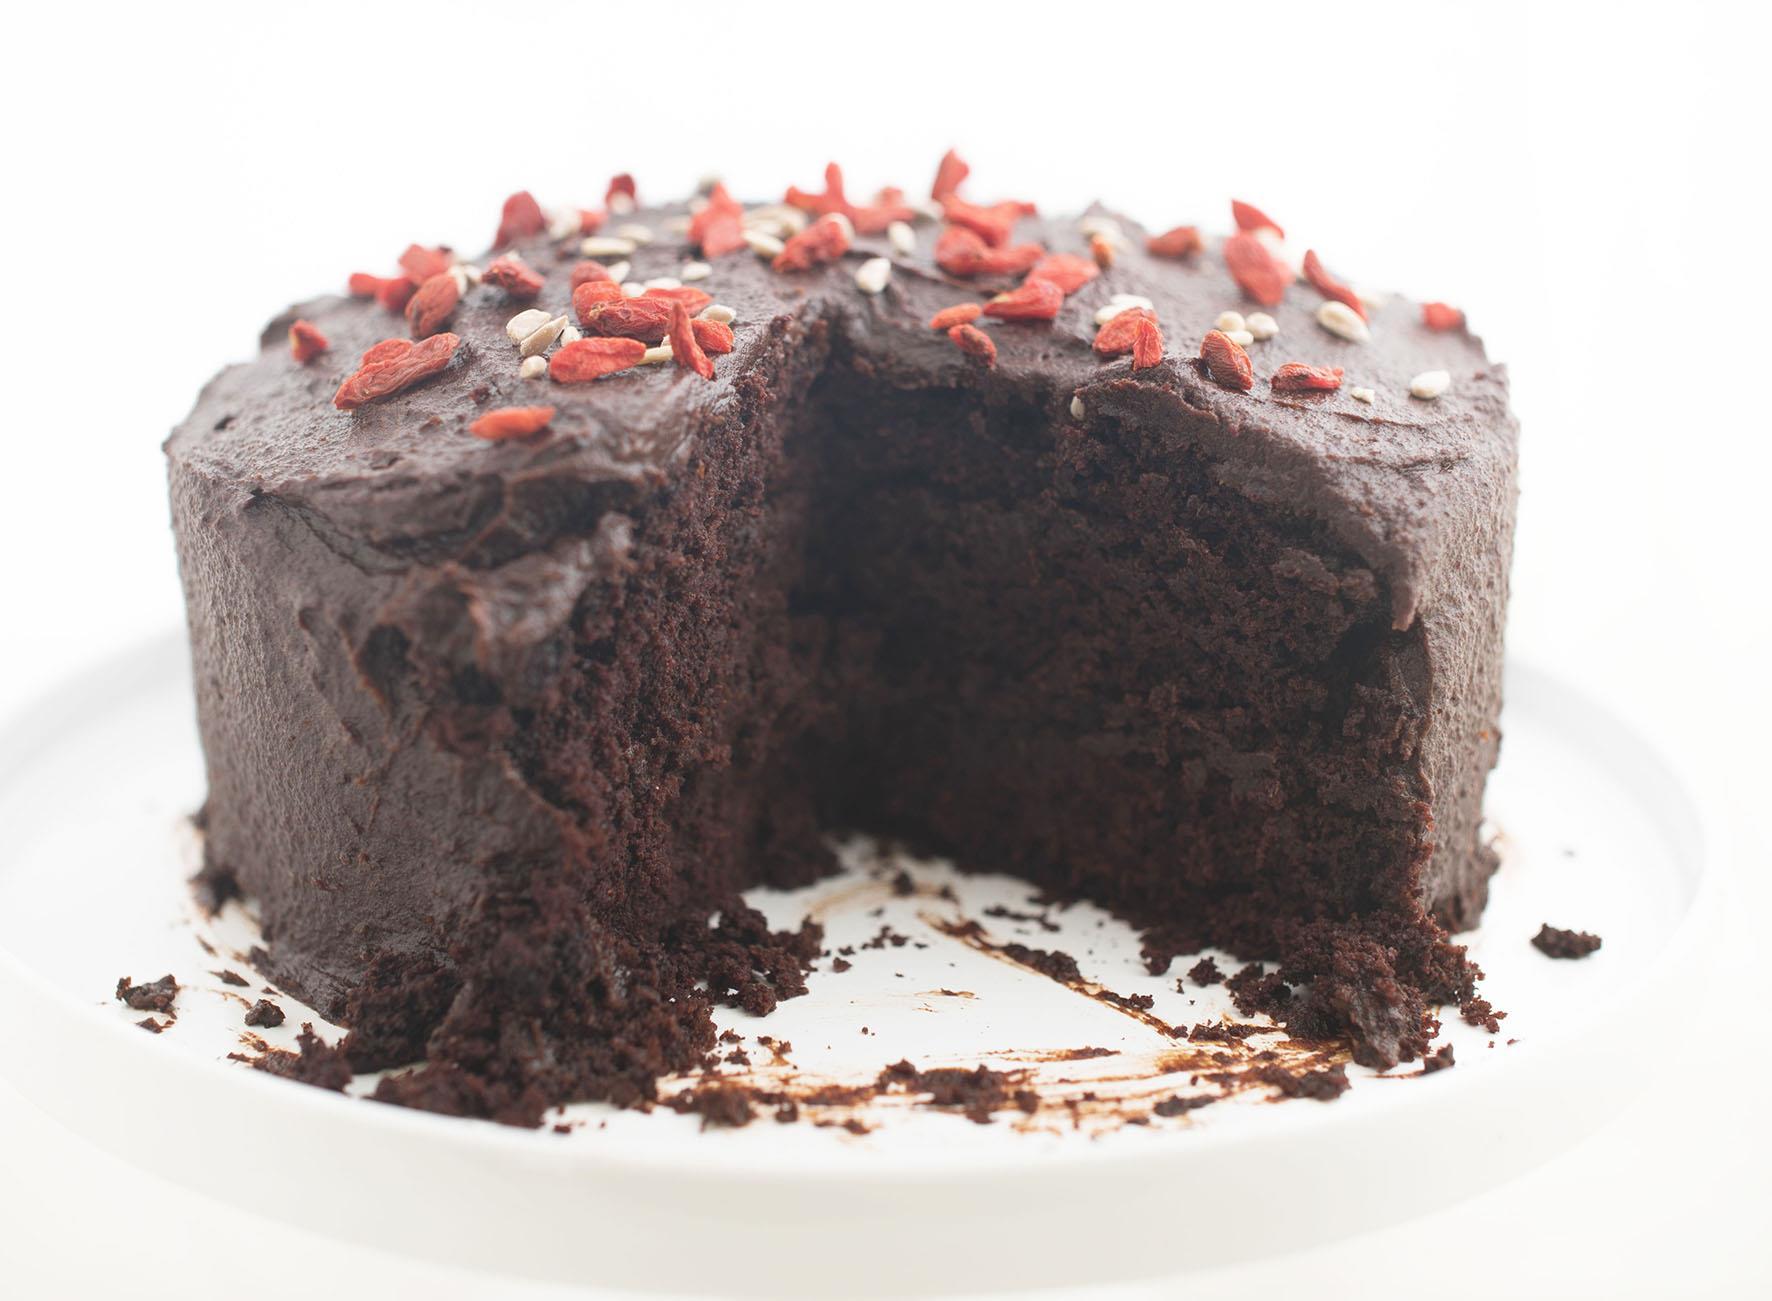 Chocolate Cake Images Free : Guilt-free chocolate cake - Enhealthy.com - Delicious ...